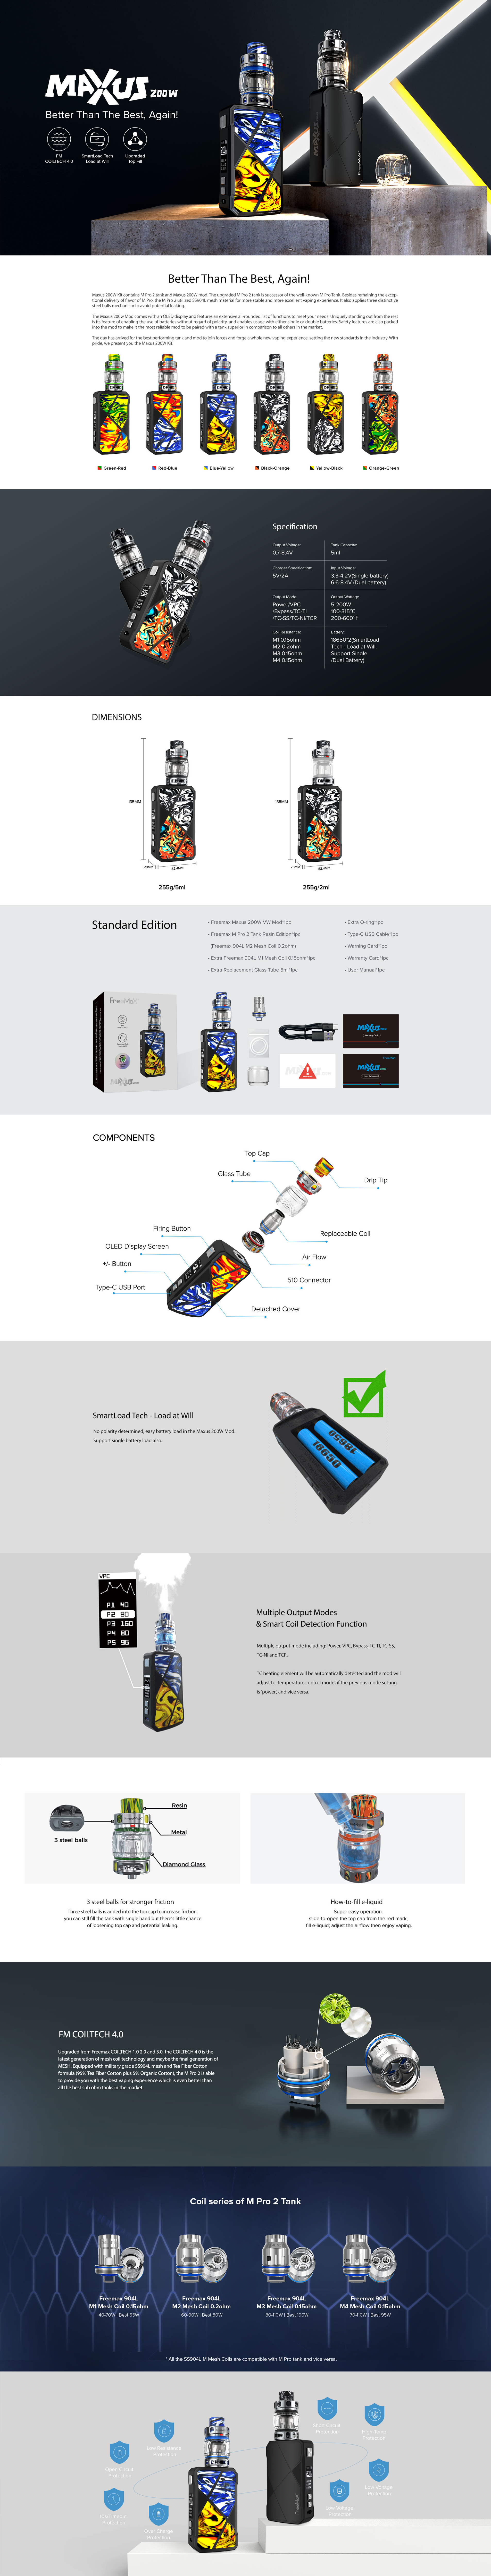 Freemax Maxus 200W Product Details.jpg